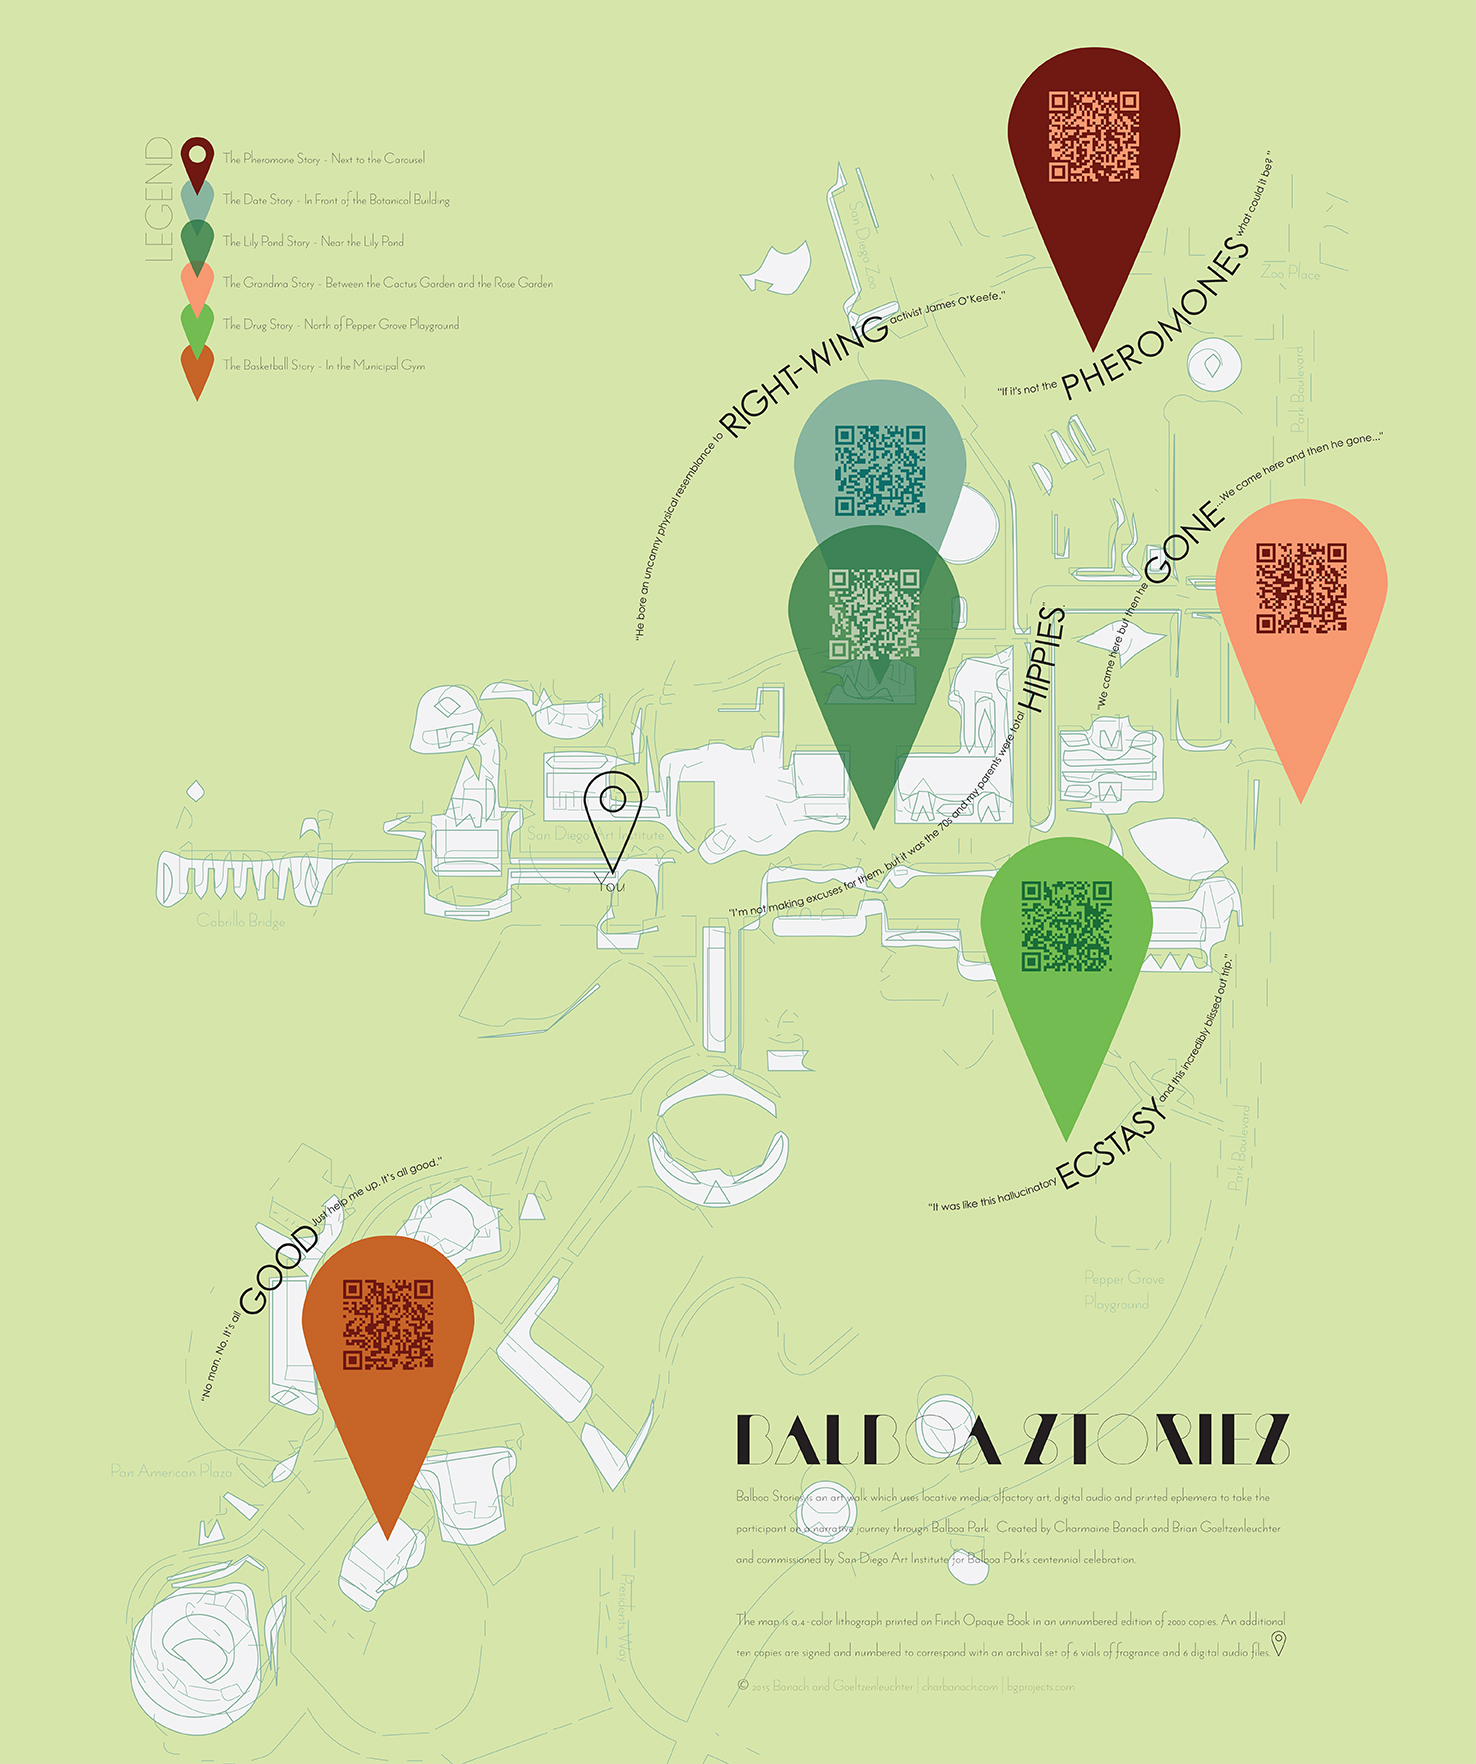 balboa map (map side) with bleed.jpg